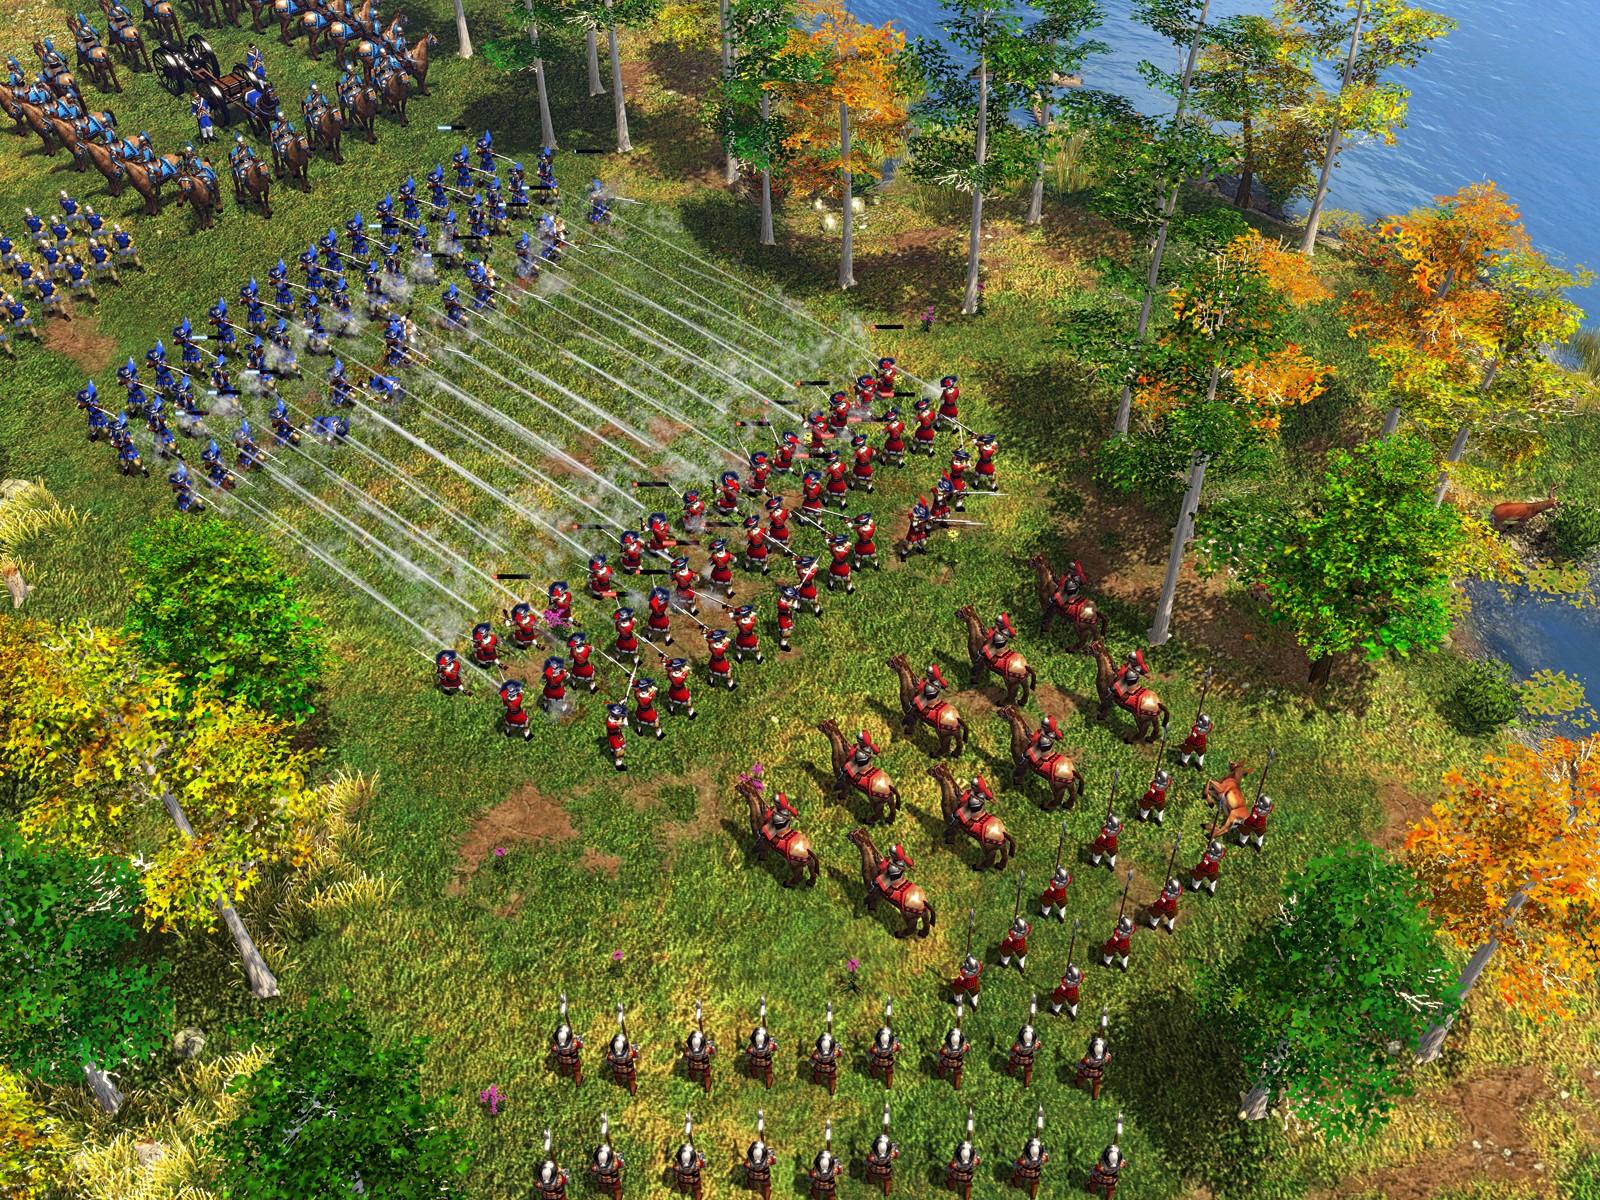 esocommunity age of empires iii tournaments replays - 1000×750